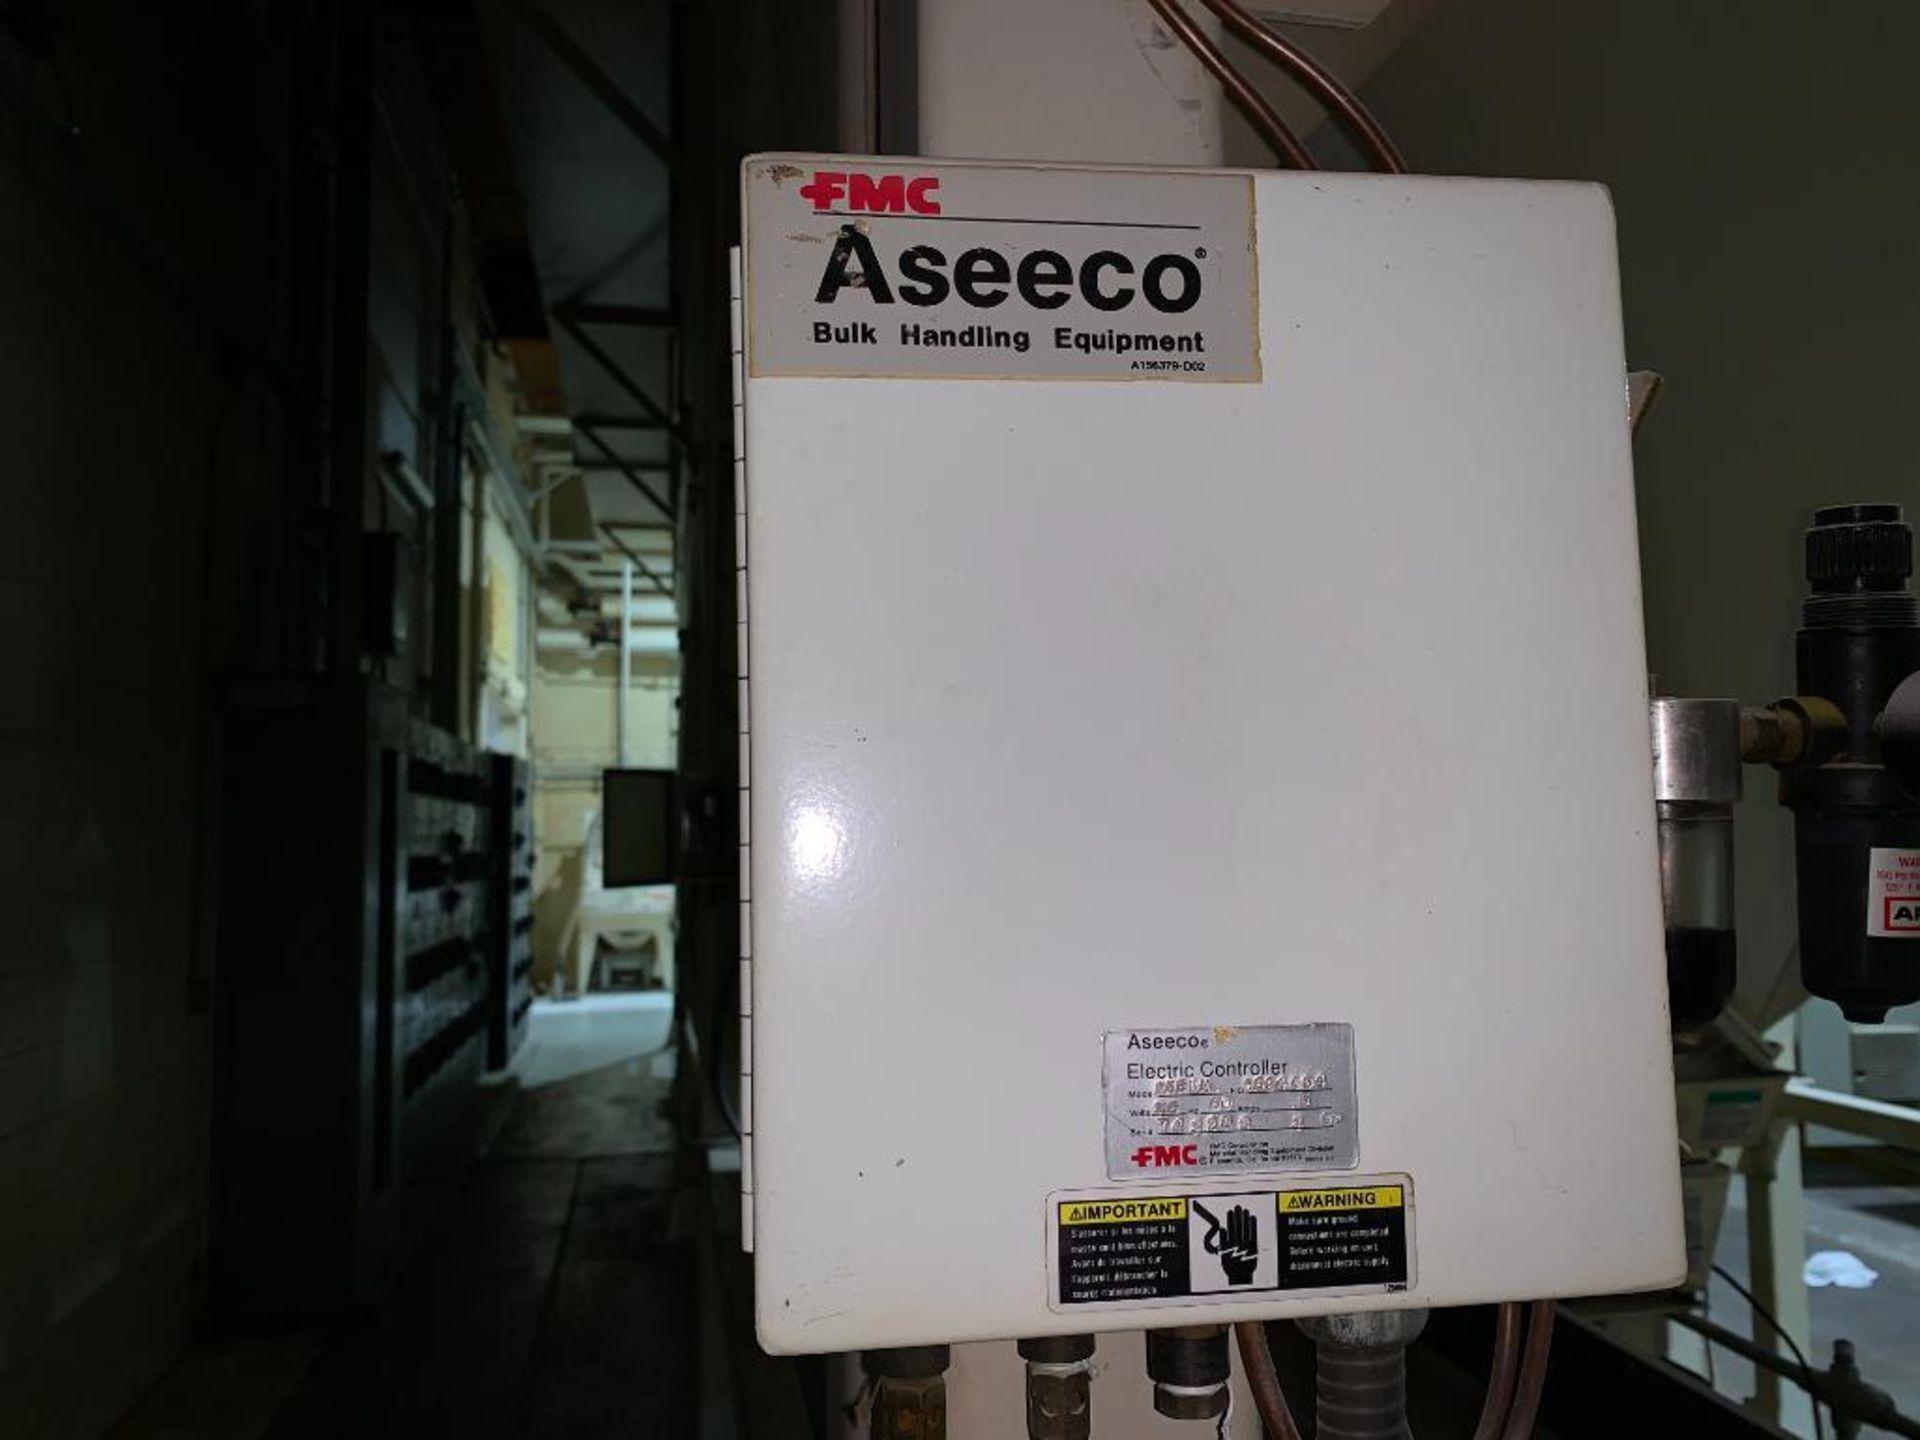 Aseeco mild steel cone bottom bulk storage bin - Image 25 of 27